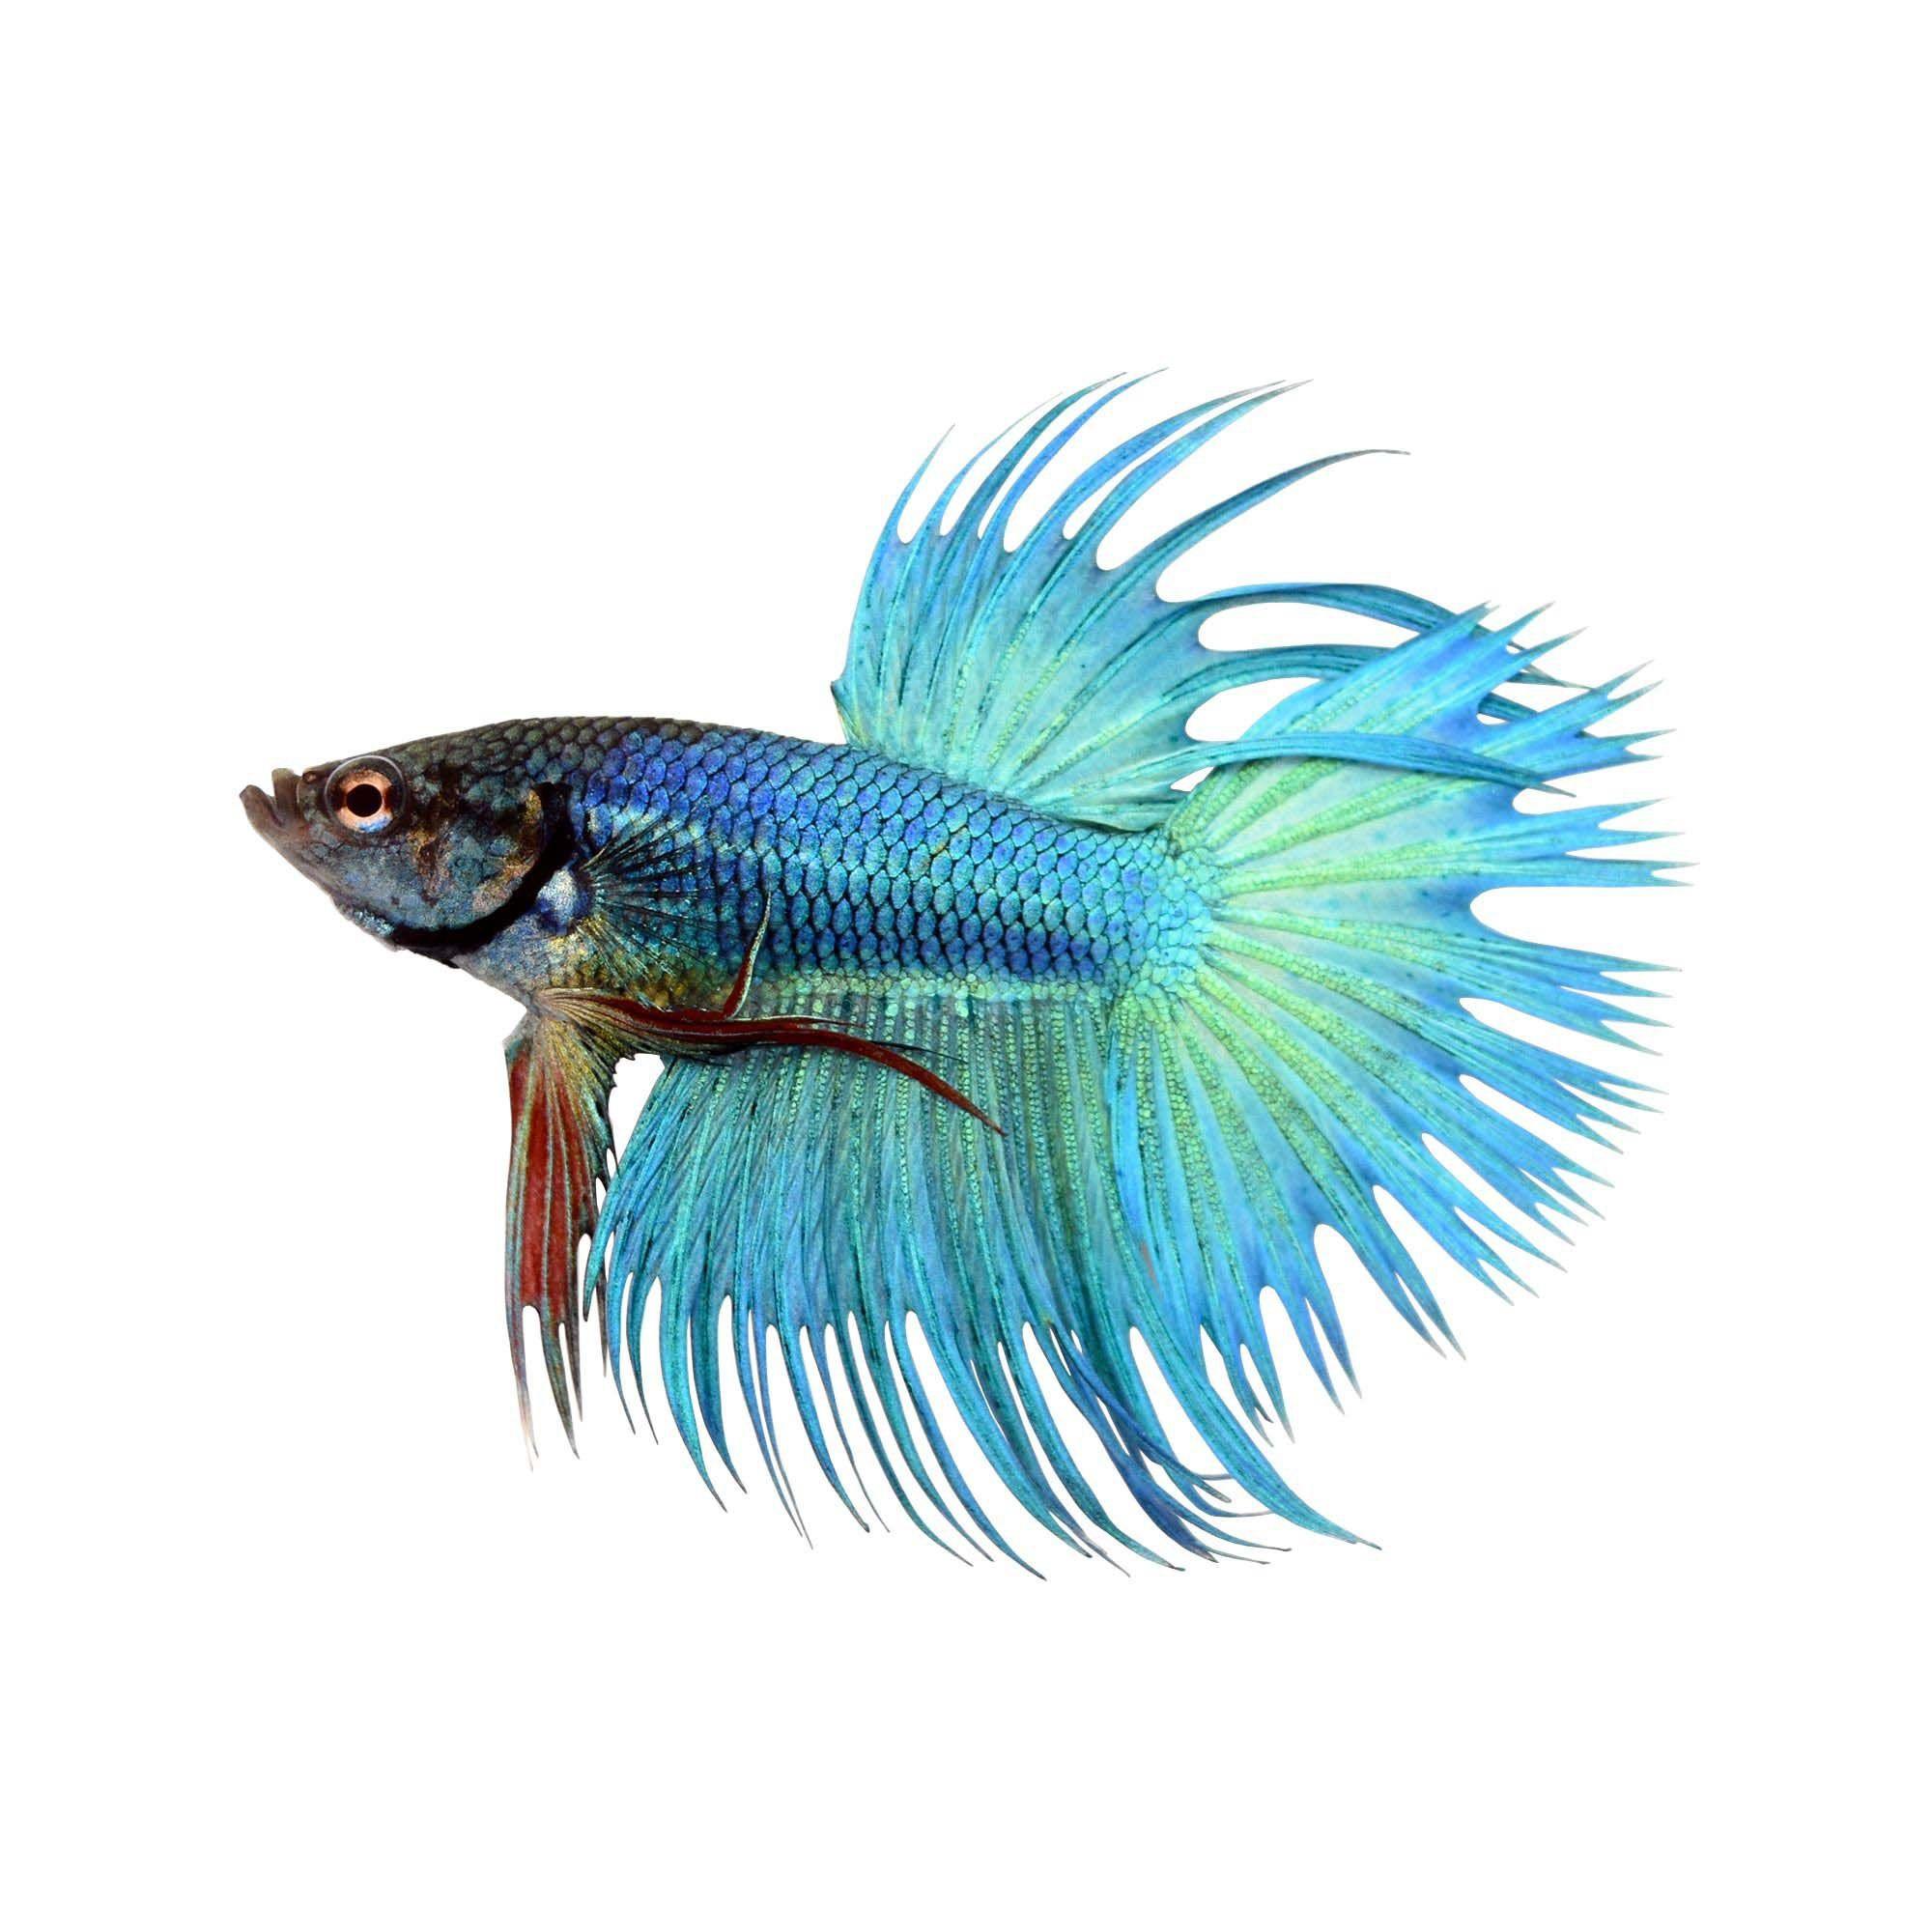 Pin On Aquarium Fish And Plants